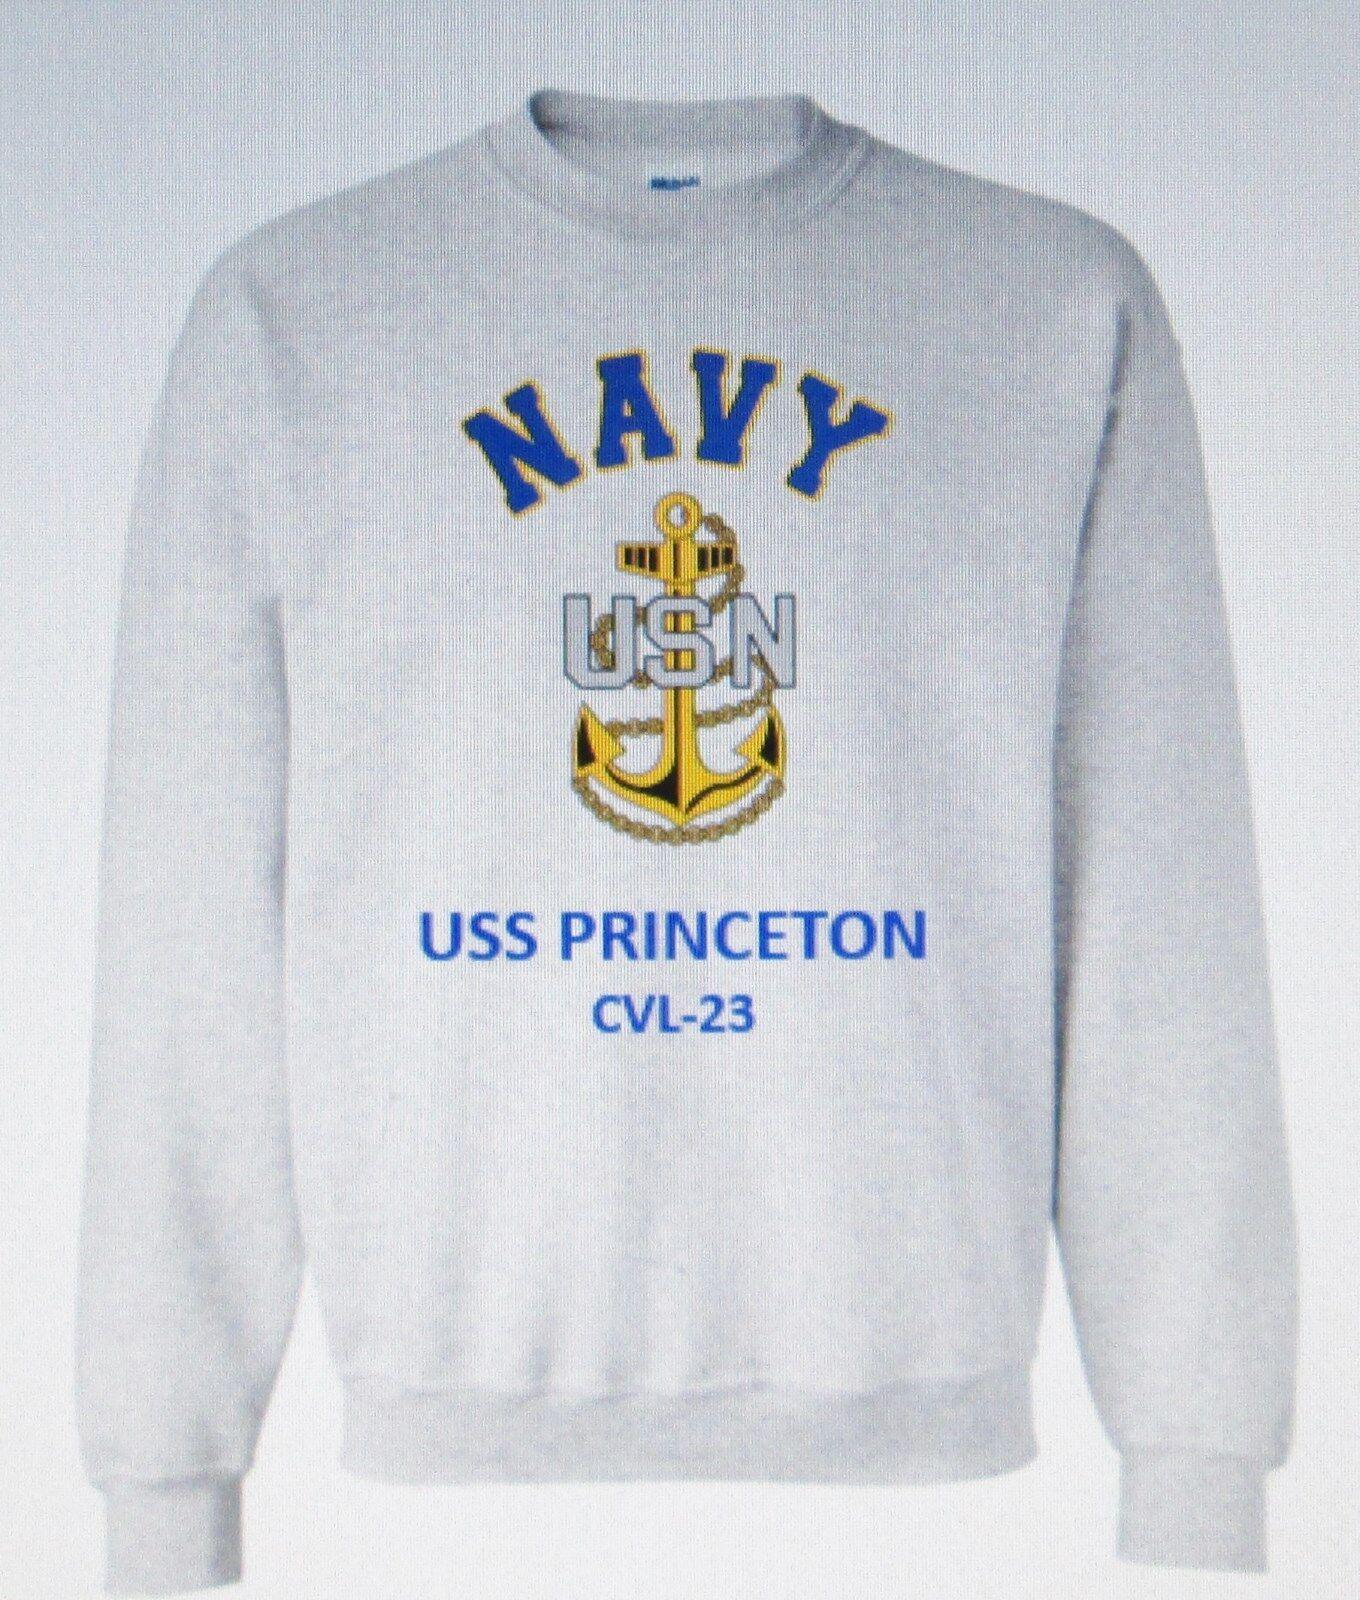 USS PRINCETON  CVL-23 AIRCRAFT CARRIER NAVY ANCHOR EMBLEM SWEATSHIRT